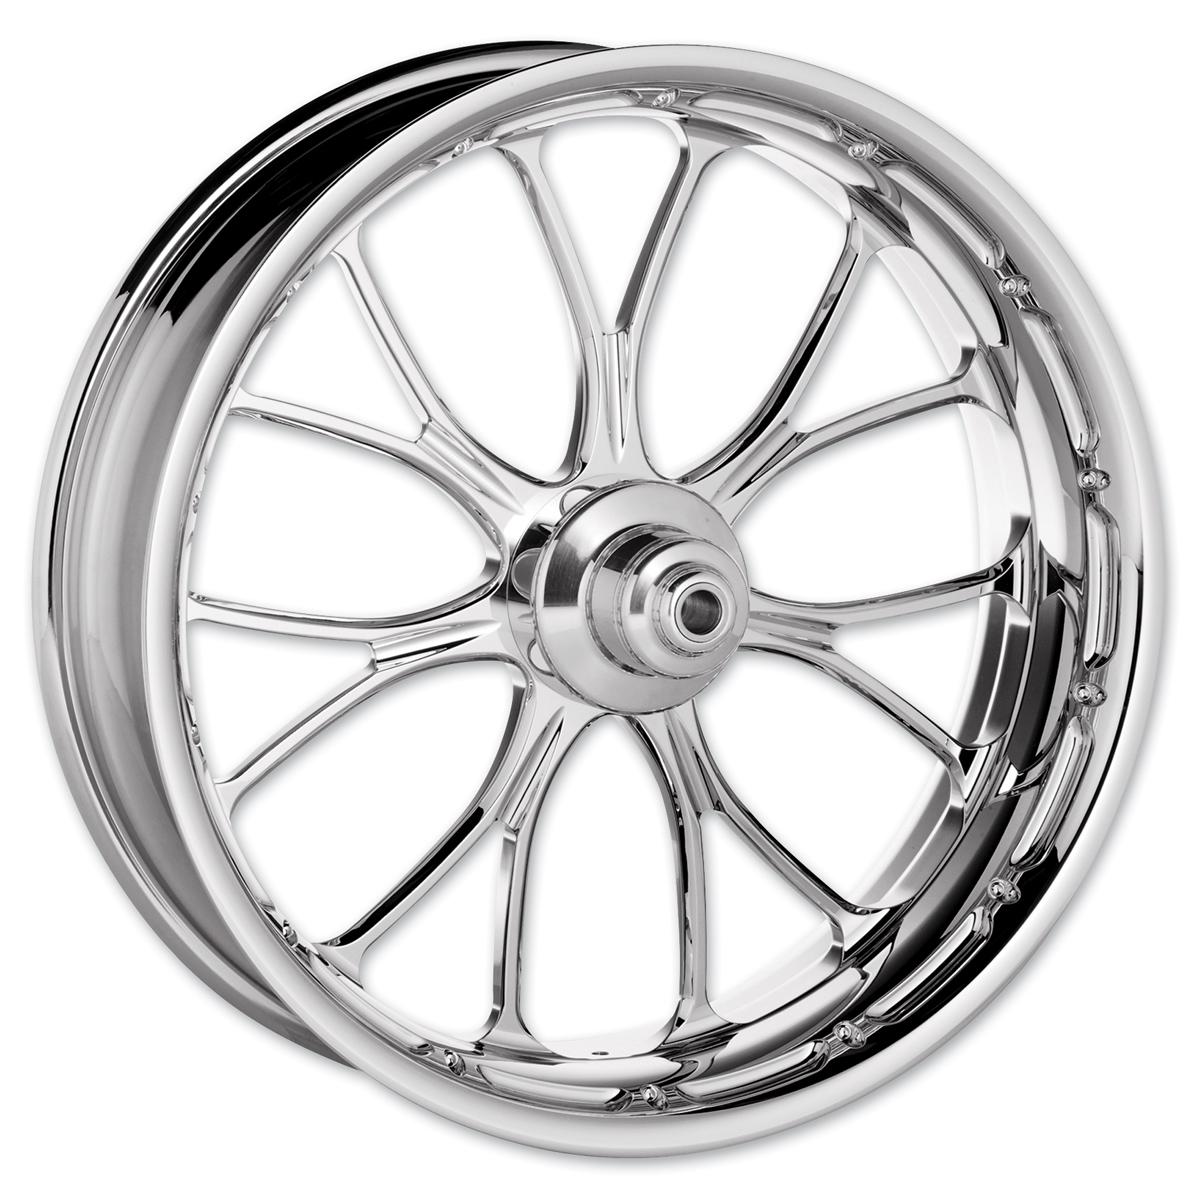 Performance Machine Heathen Chrome Rear Wheel 18x3.5